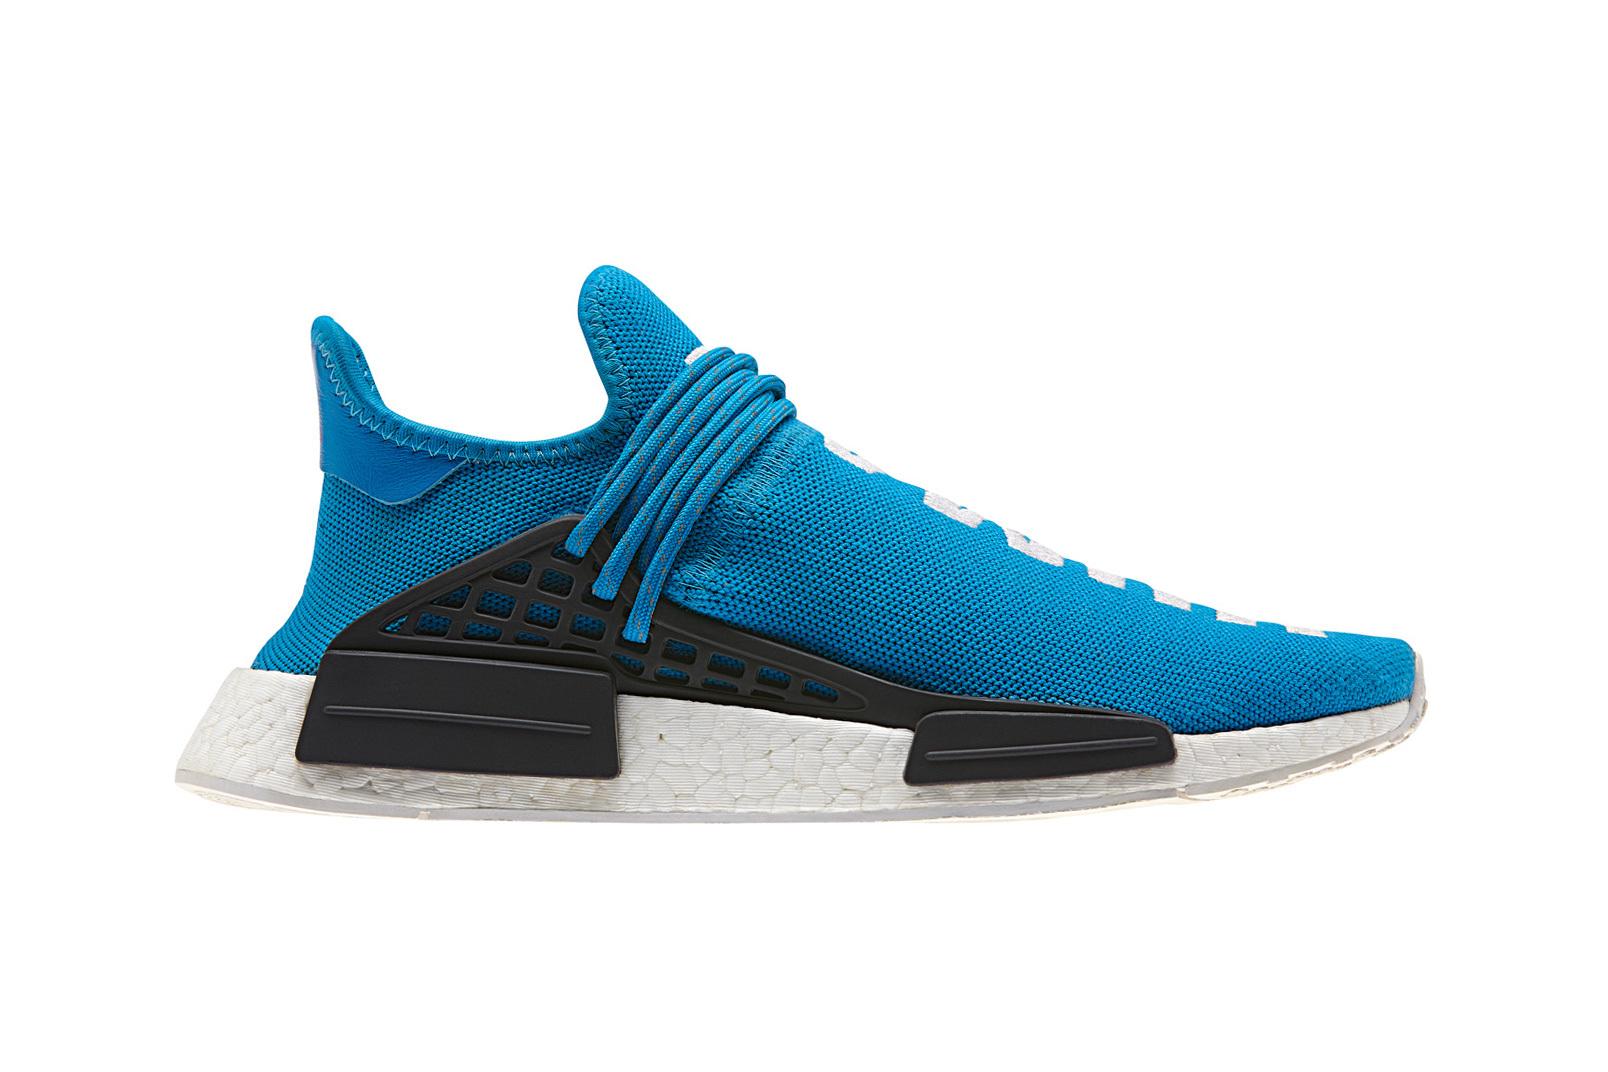 pharrell-williams-adidas-originals-hu-collection-16